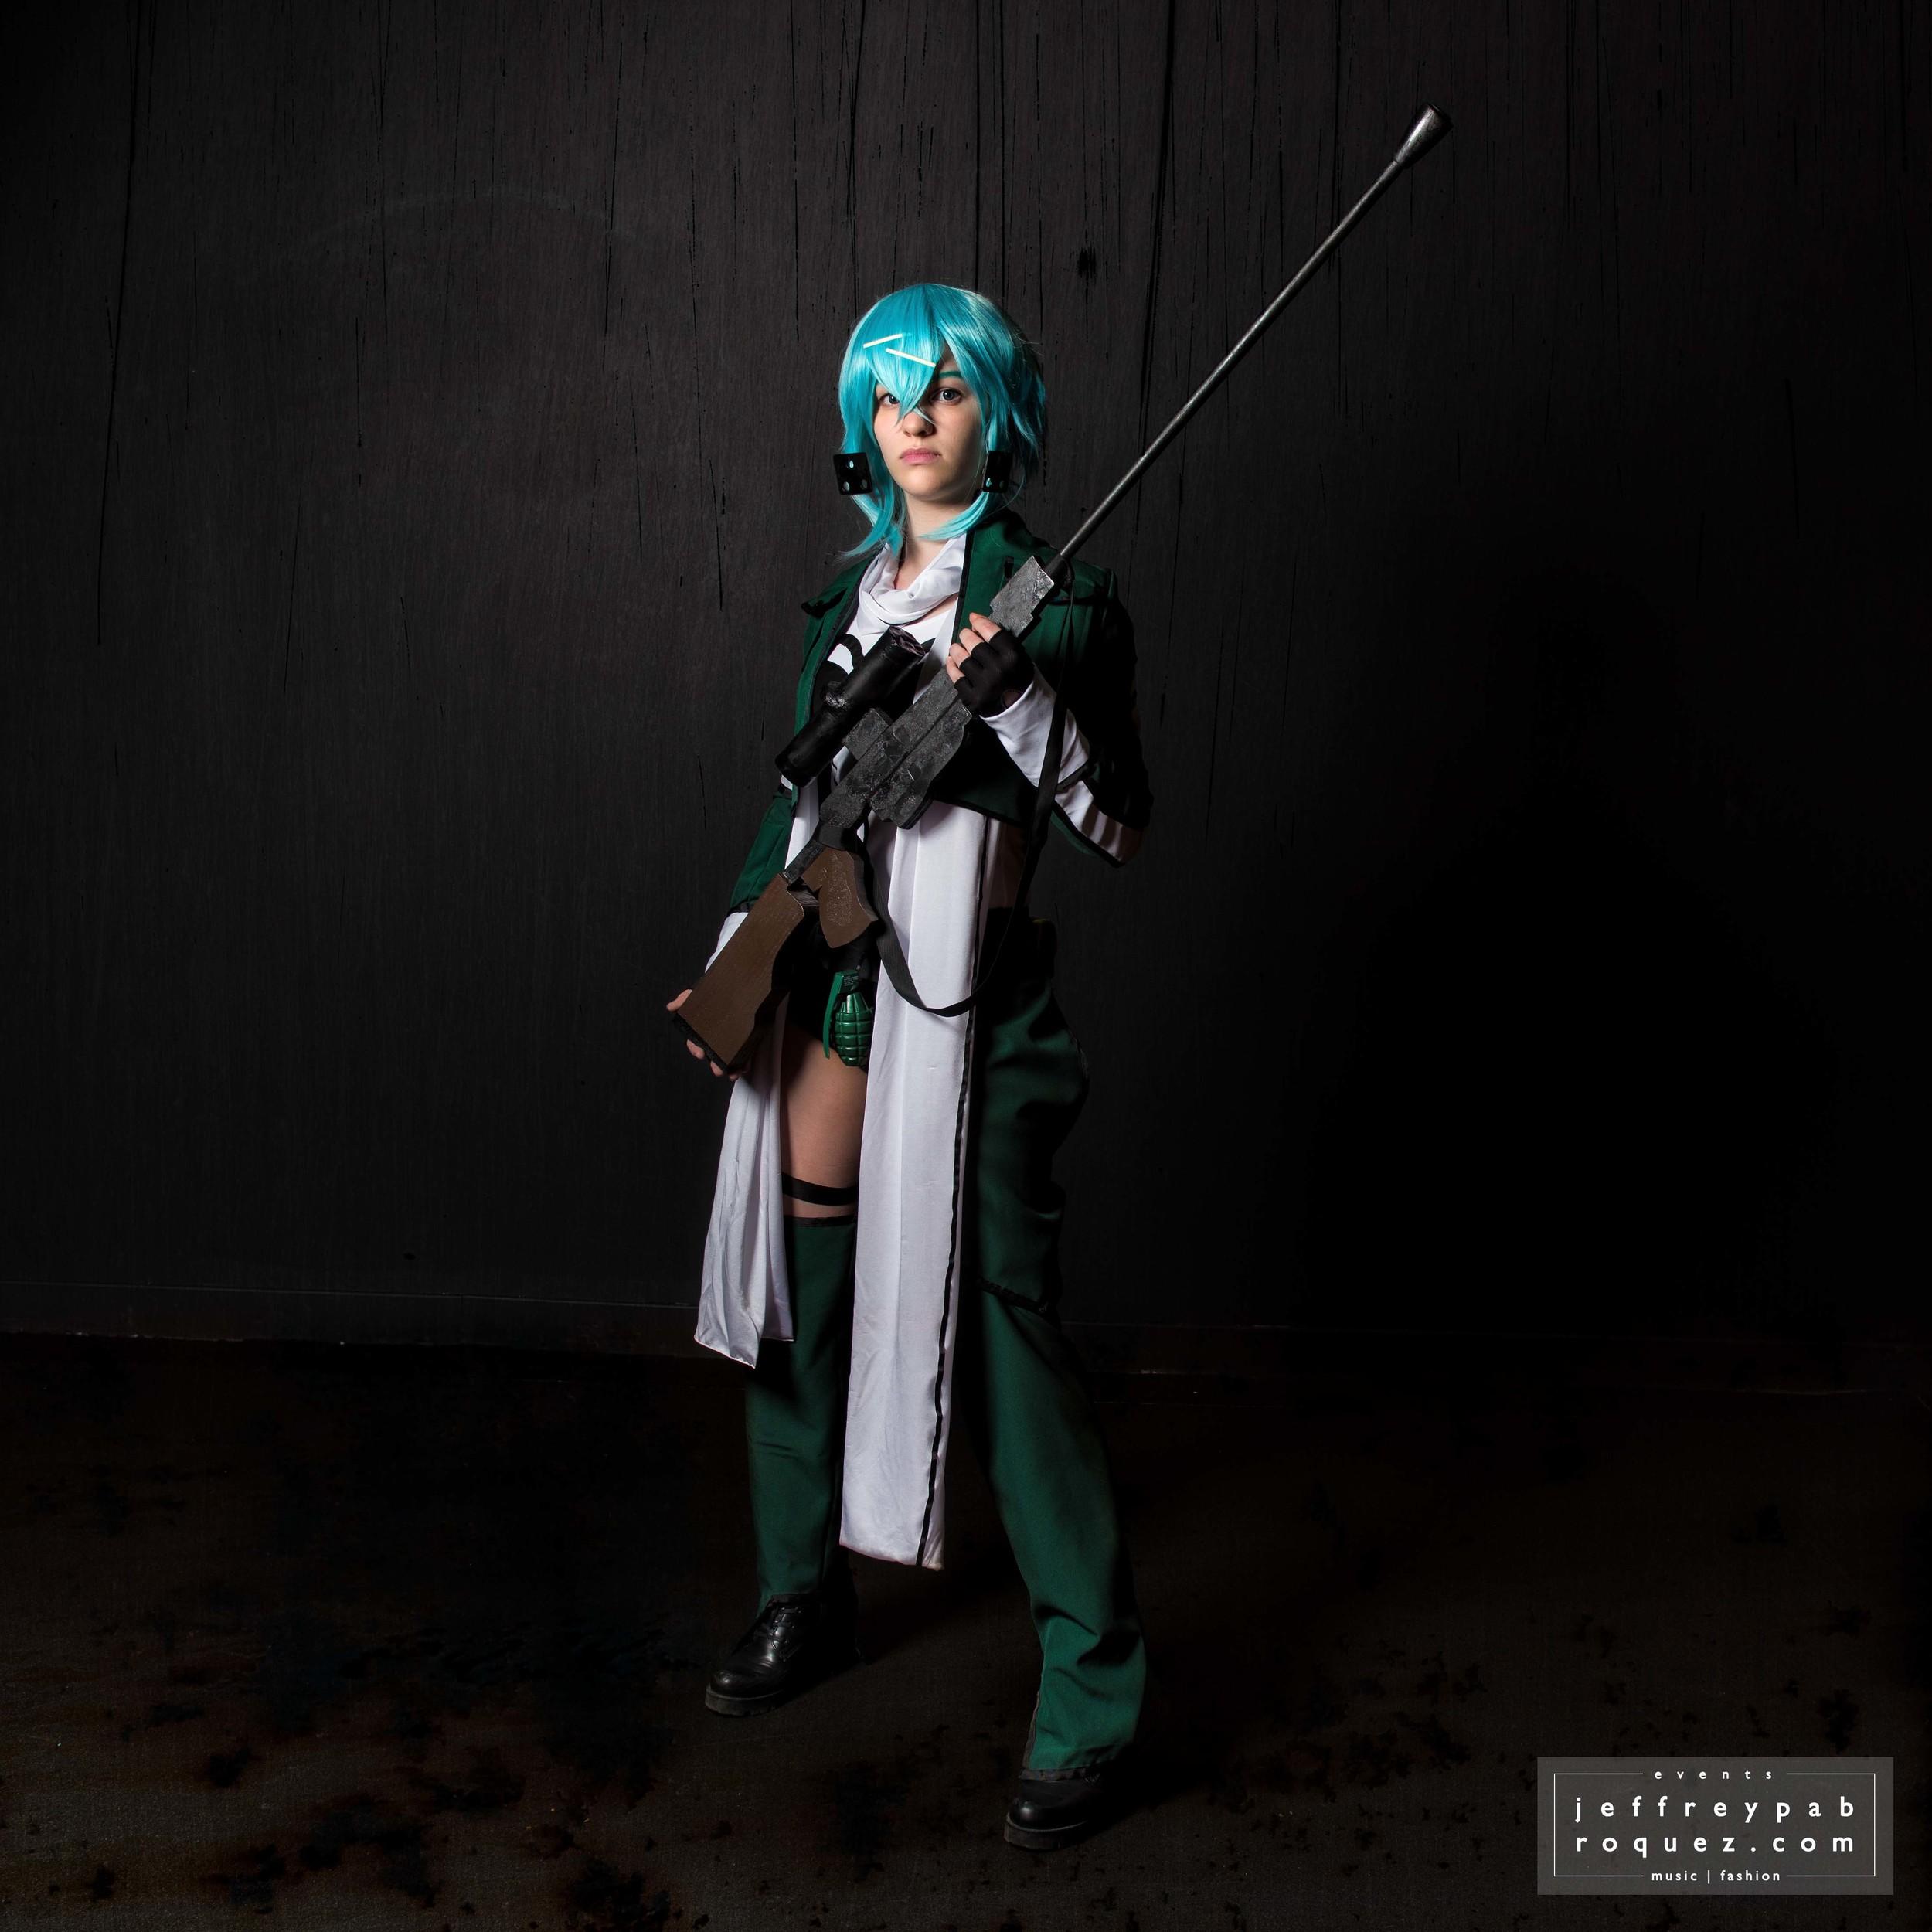 Sinon | Sword Art